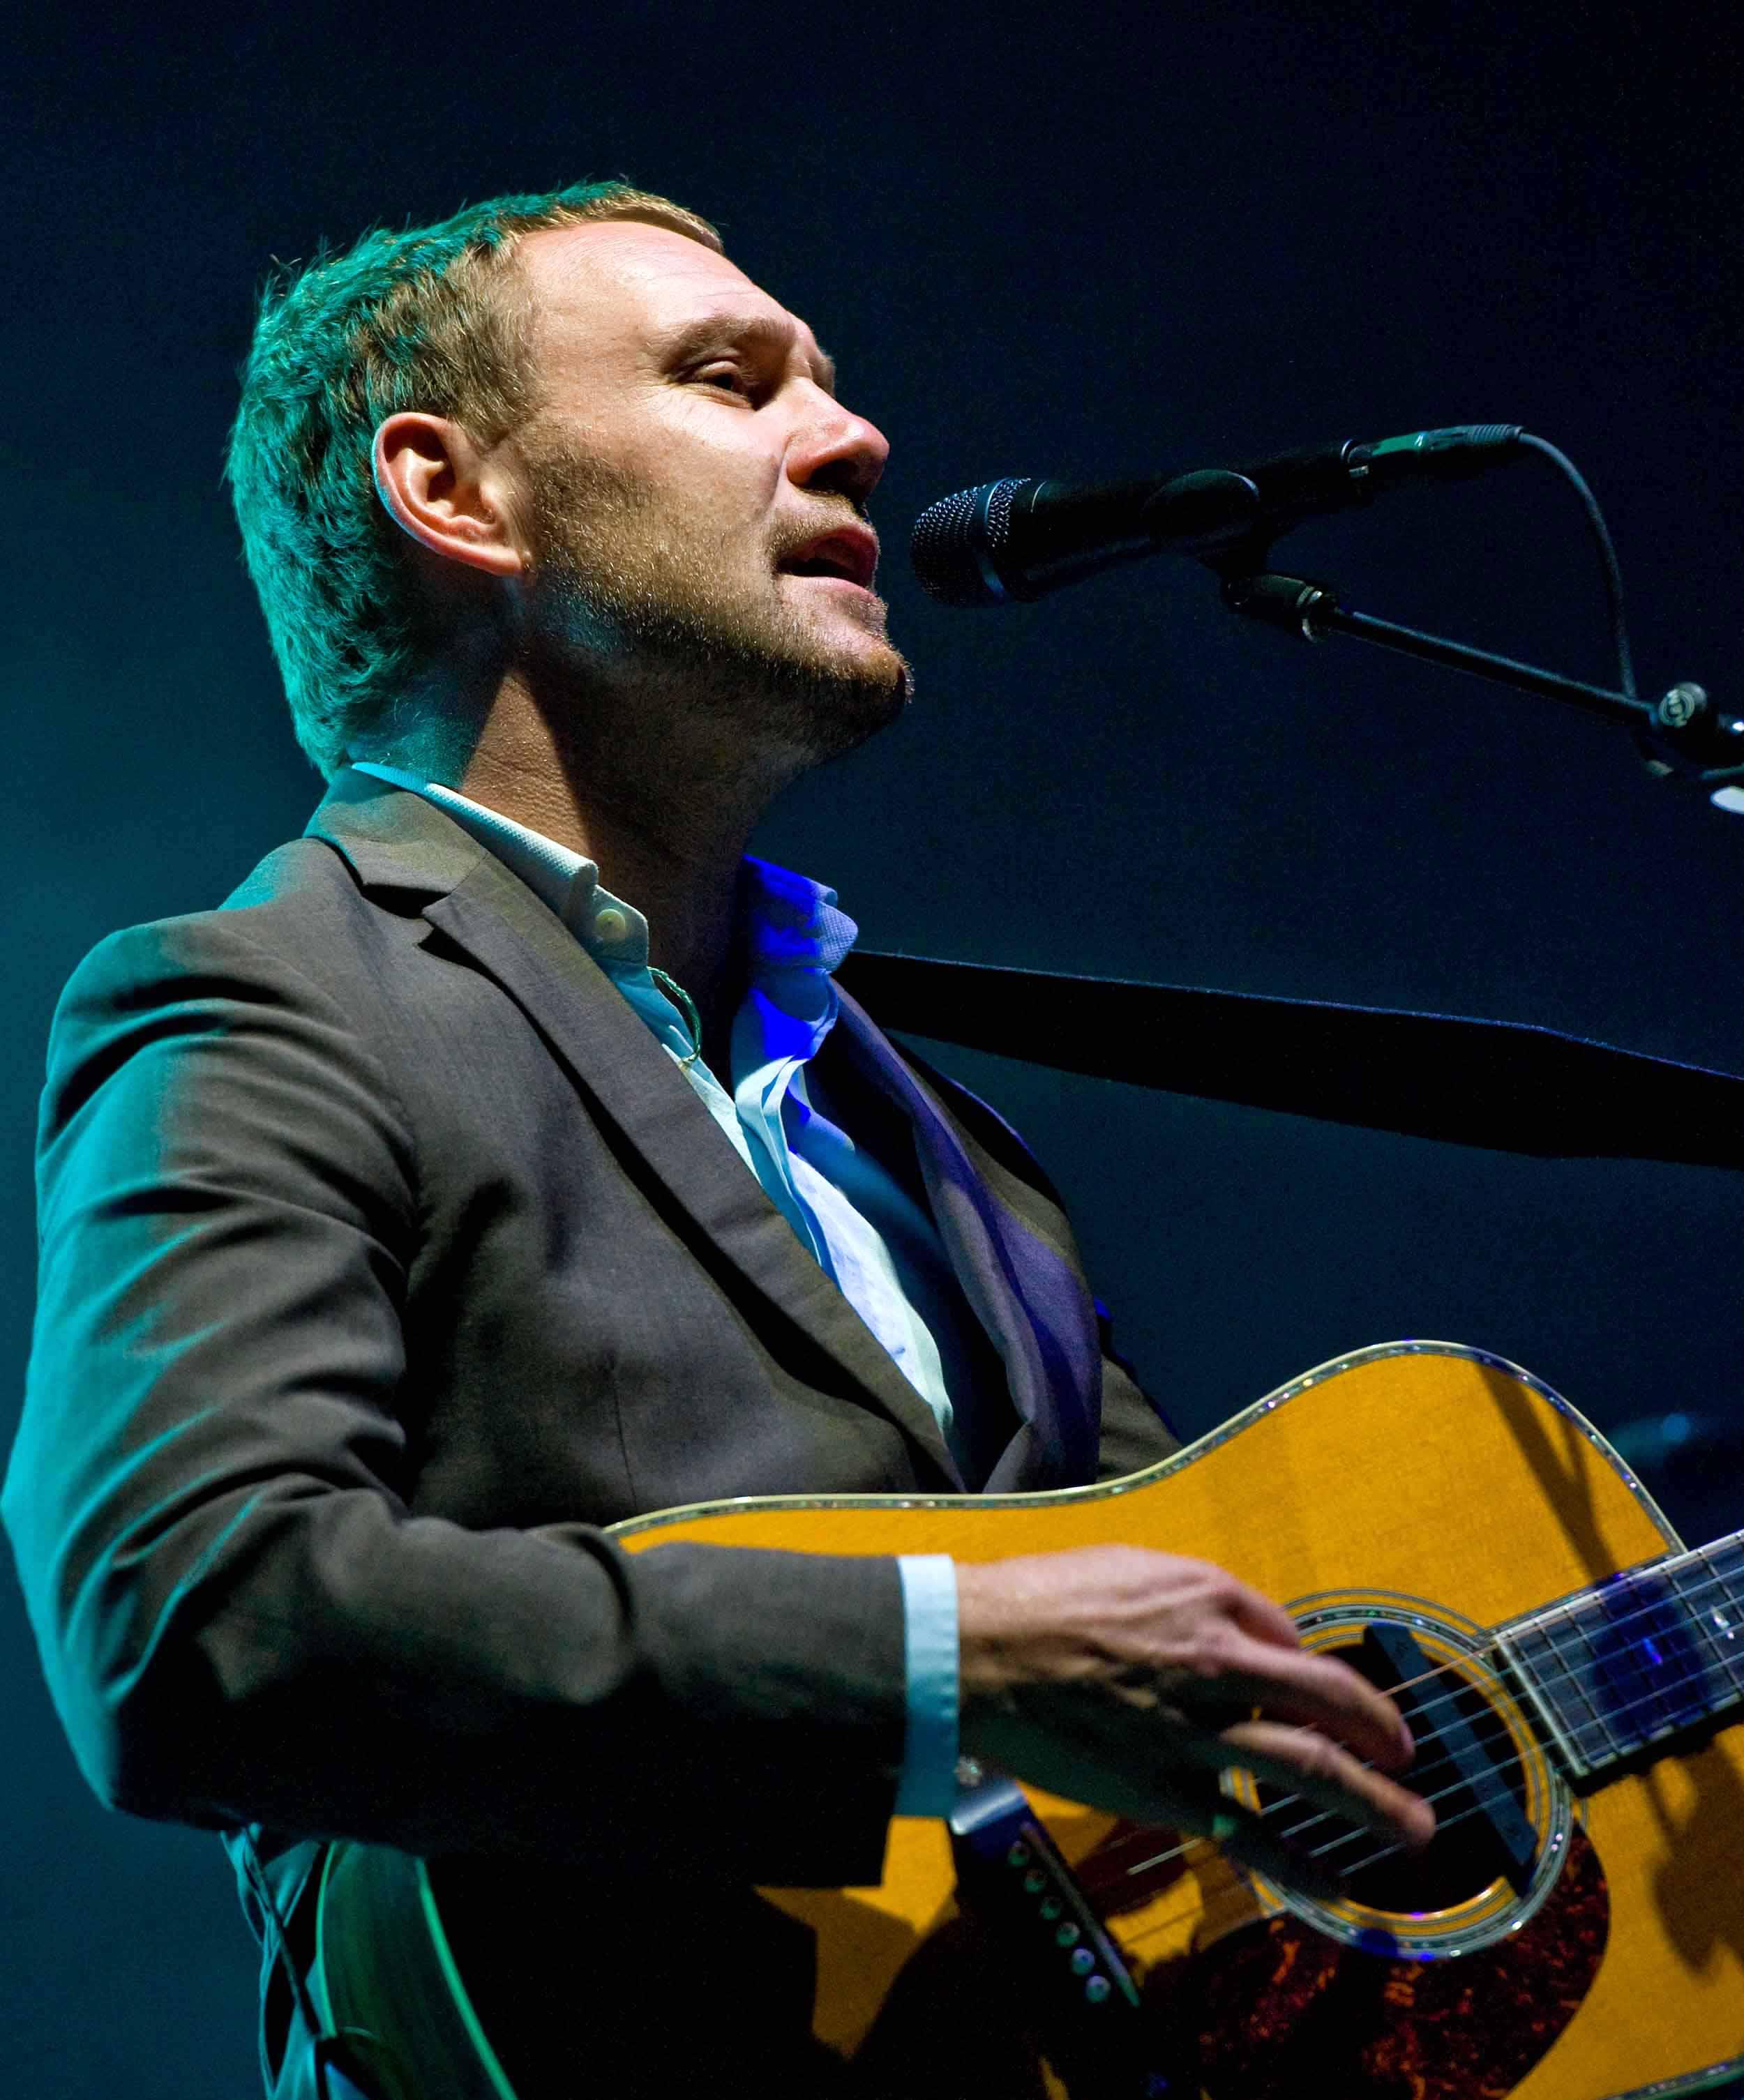 David Gray (musician) - Wikipedia